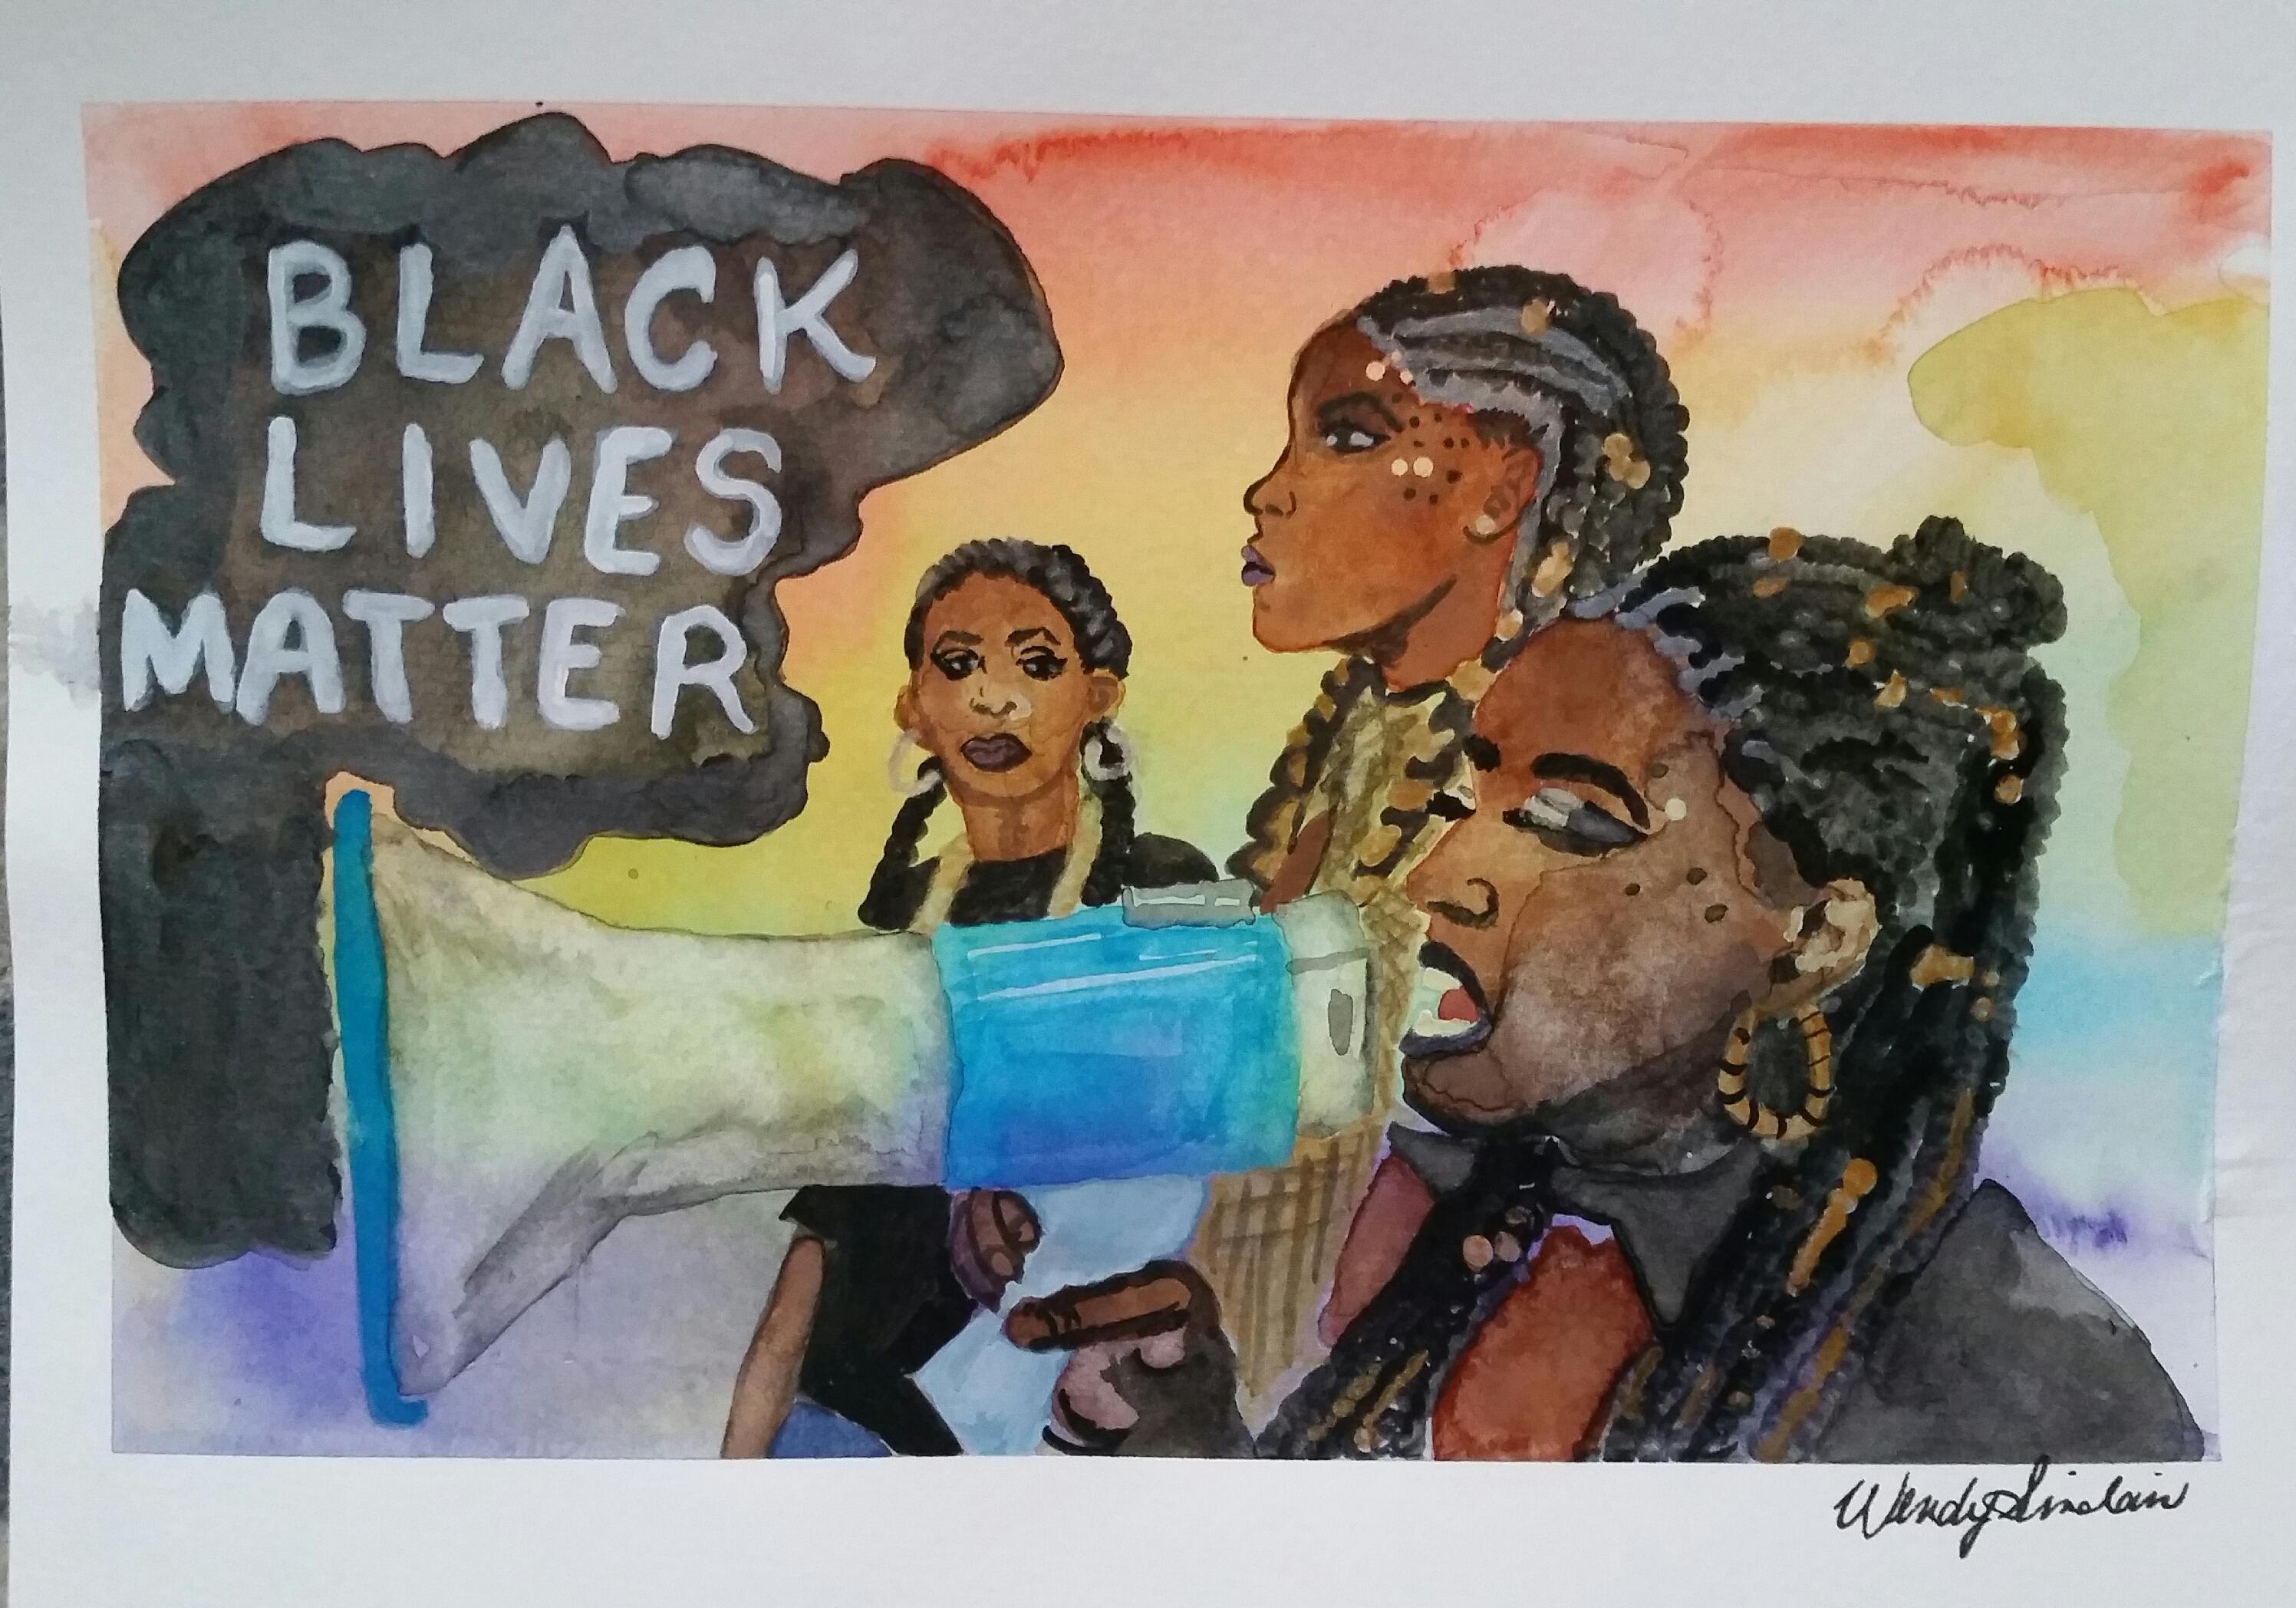 Black Lives Matter at Pride Toronto